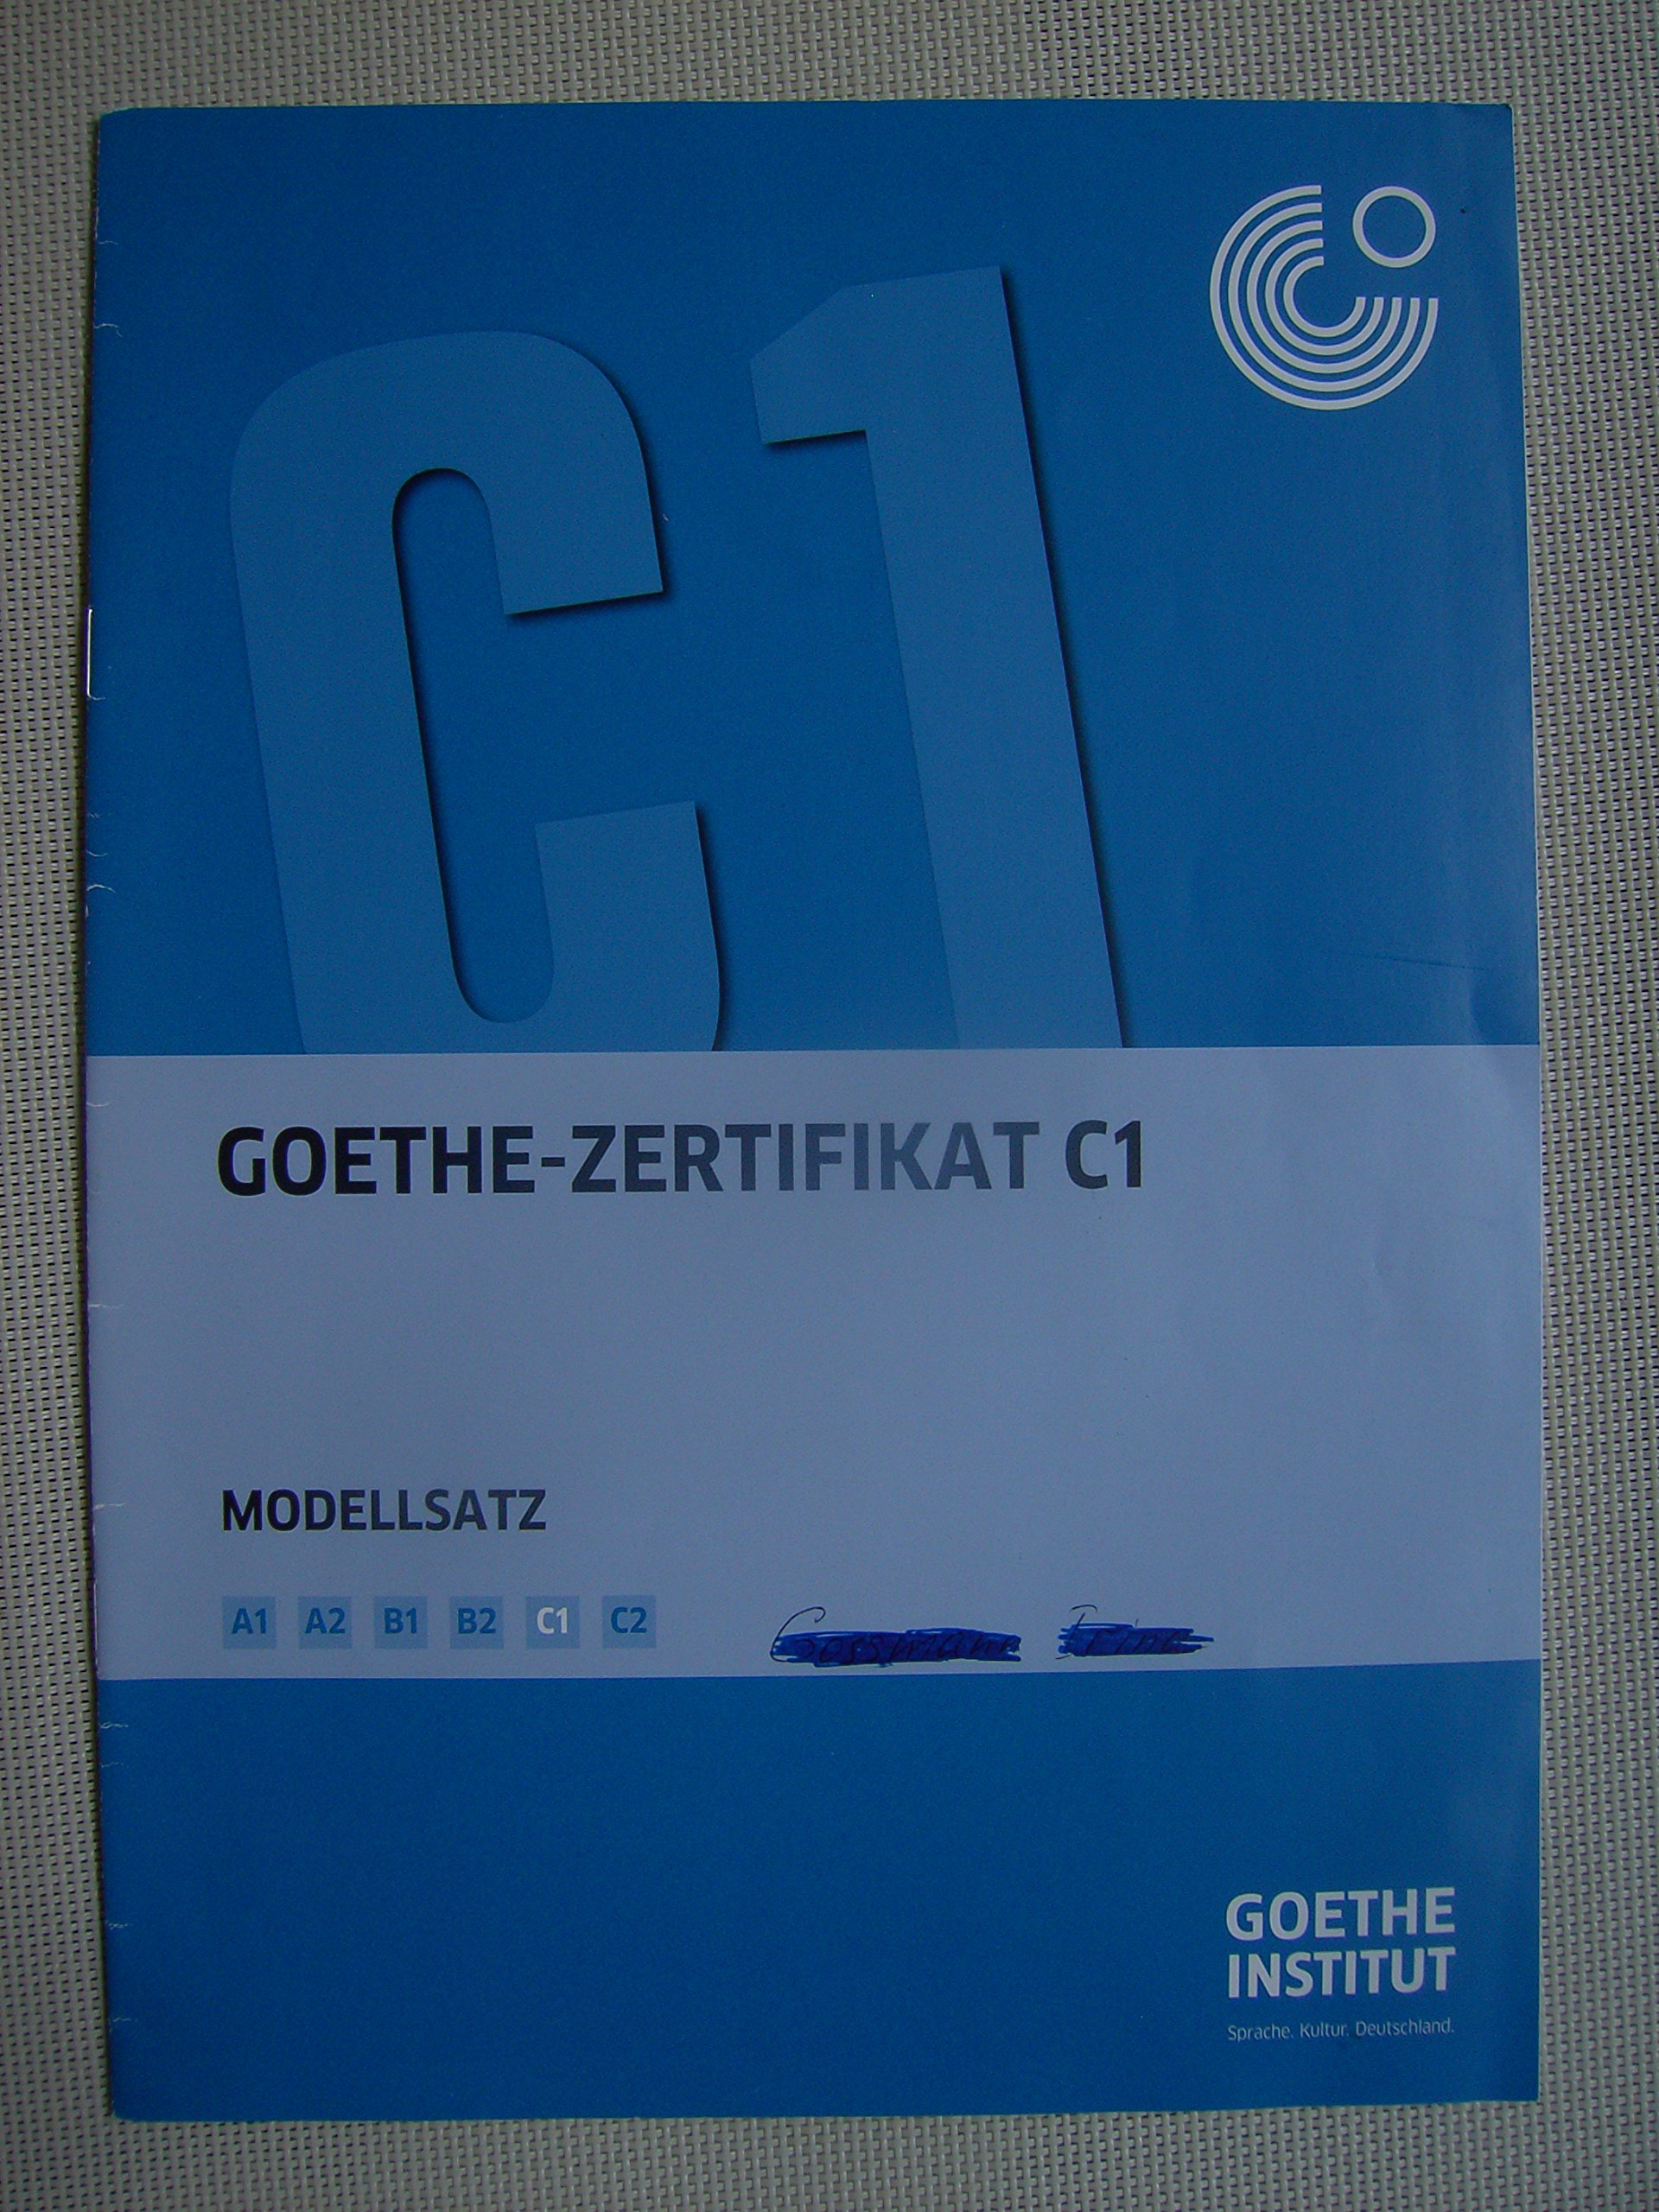 Goethe Zertifikat C1 Modellsatz Kandidatenblätter Prüferblätter